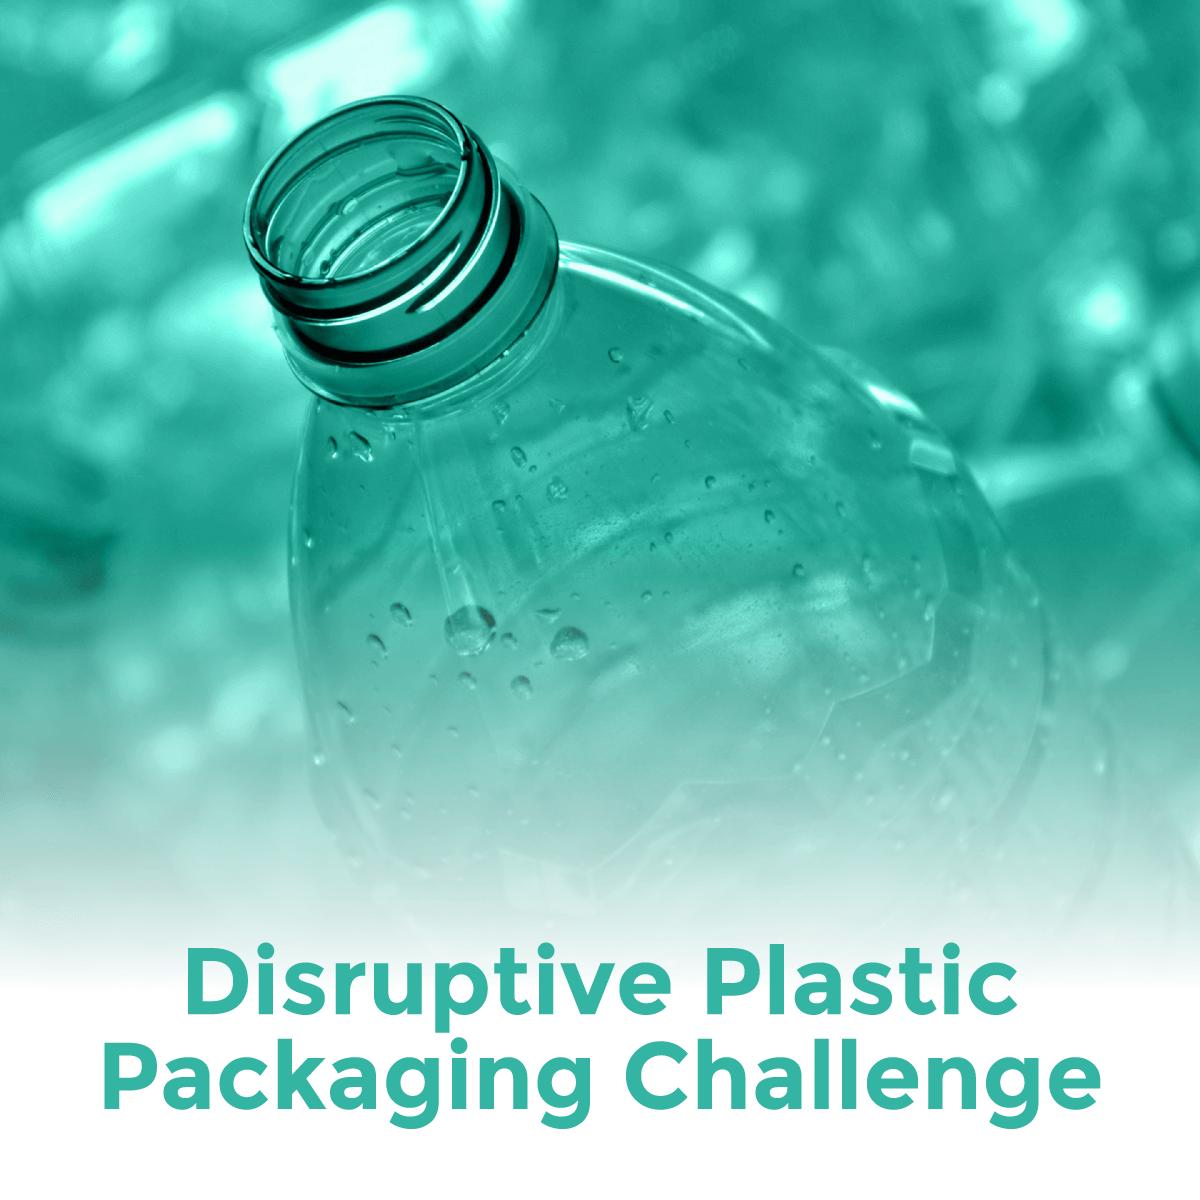 Disruptive Plastic Packaging Challenge